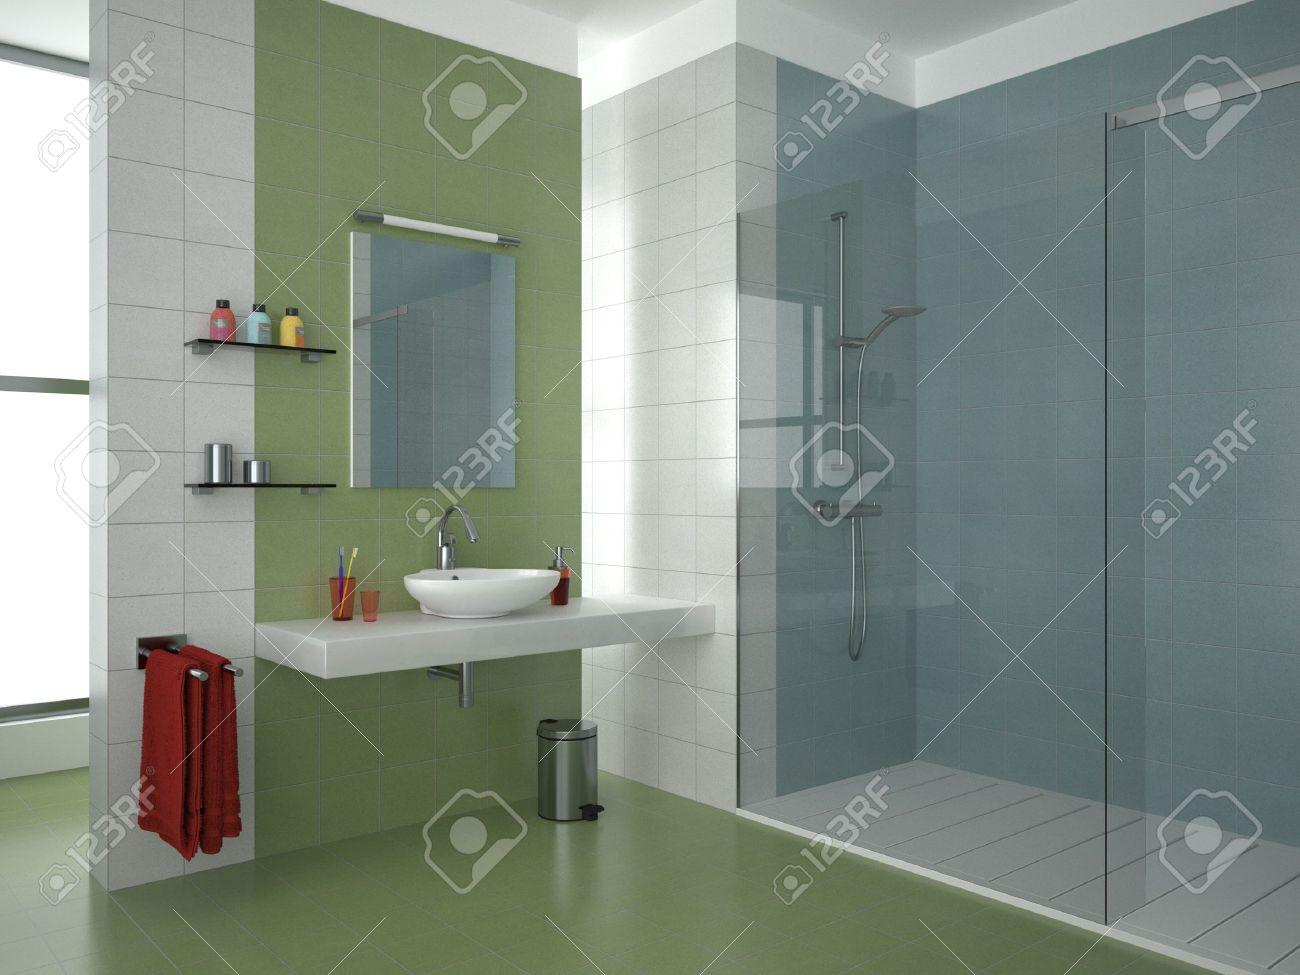 badezimmer fliesen mosaik bunt | viditude, Badezimmer ideen